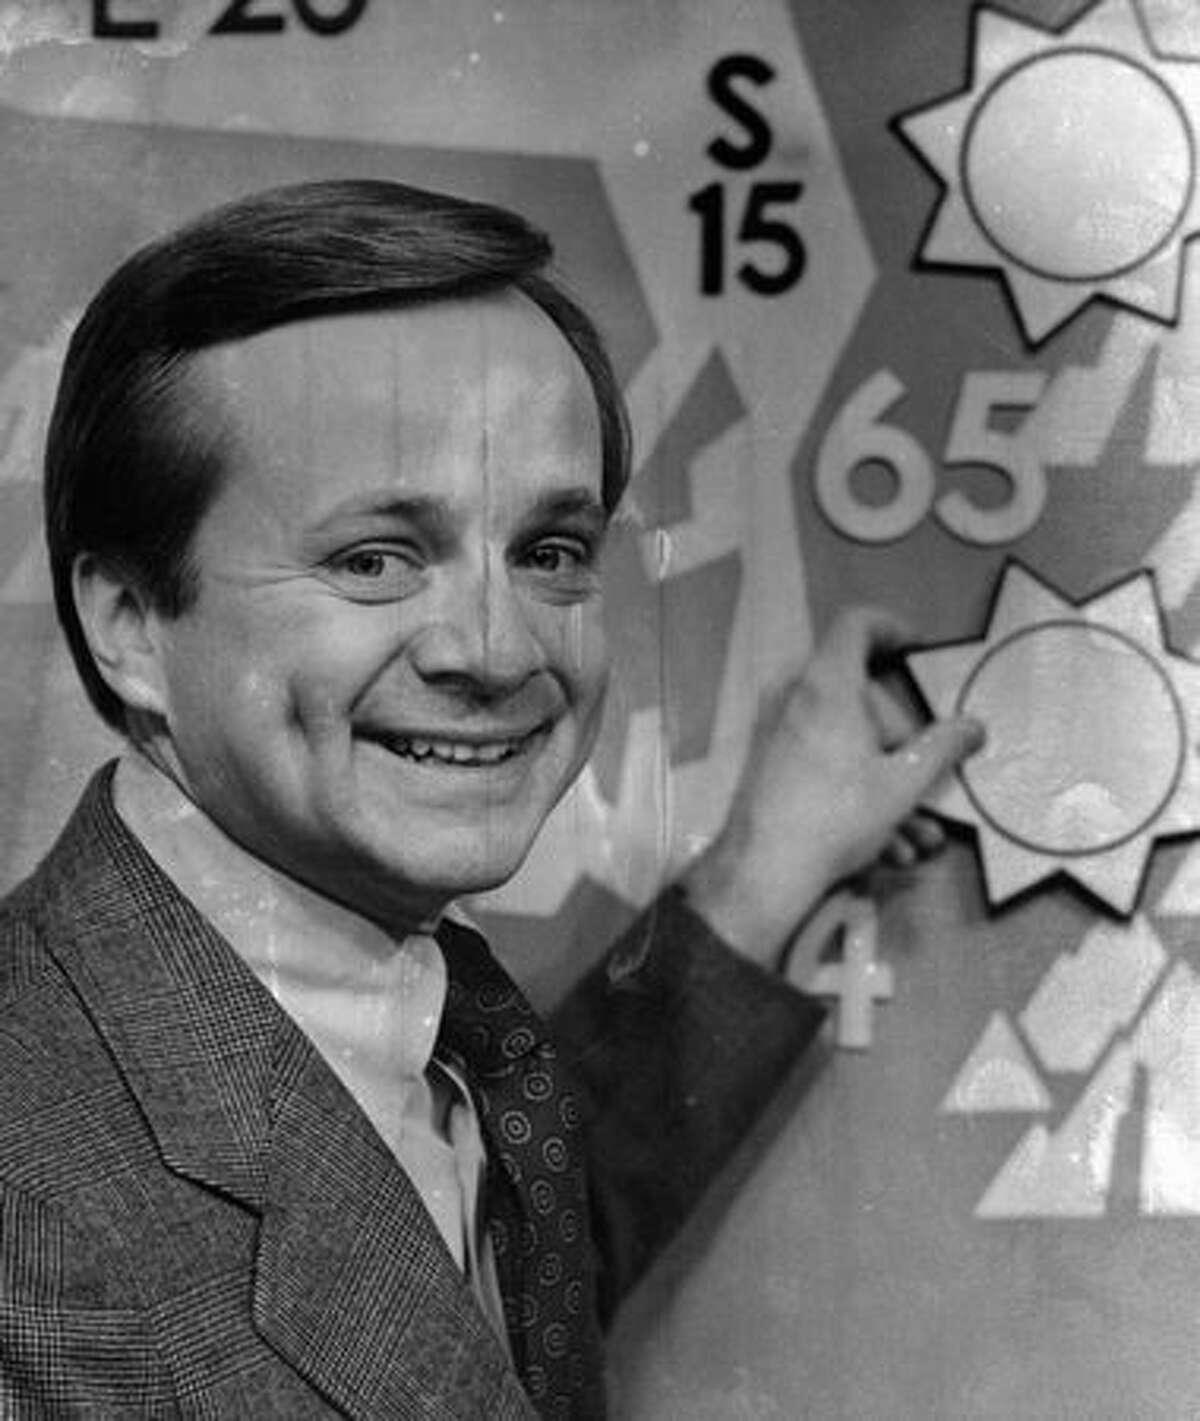 Former KIRO meteorologist Harry Wappler in Nov. 1977. Wappler died April 21 at age 73. (Grant M. Haller/seattlepi.com file)